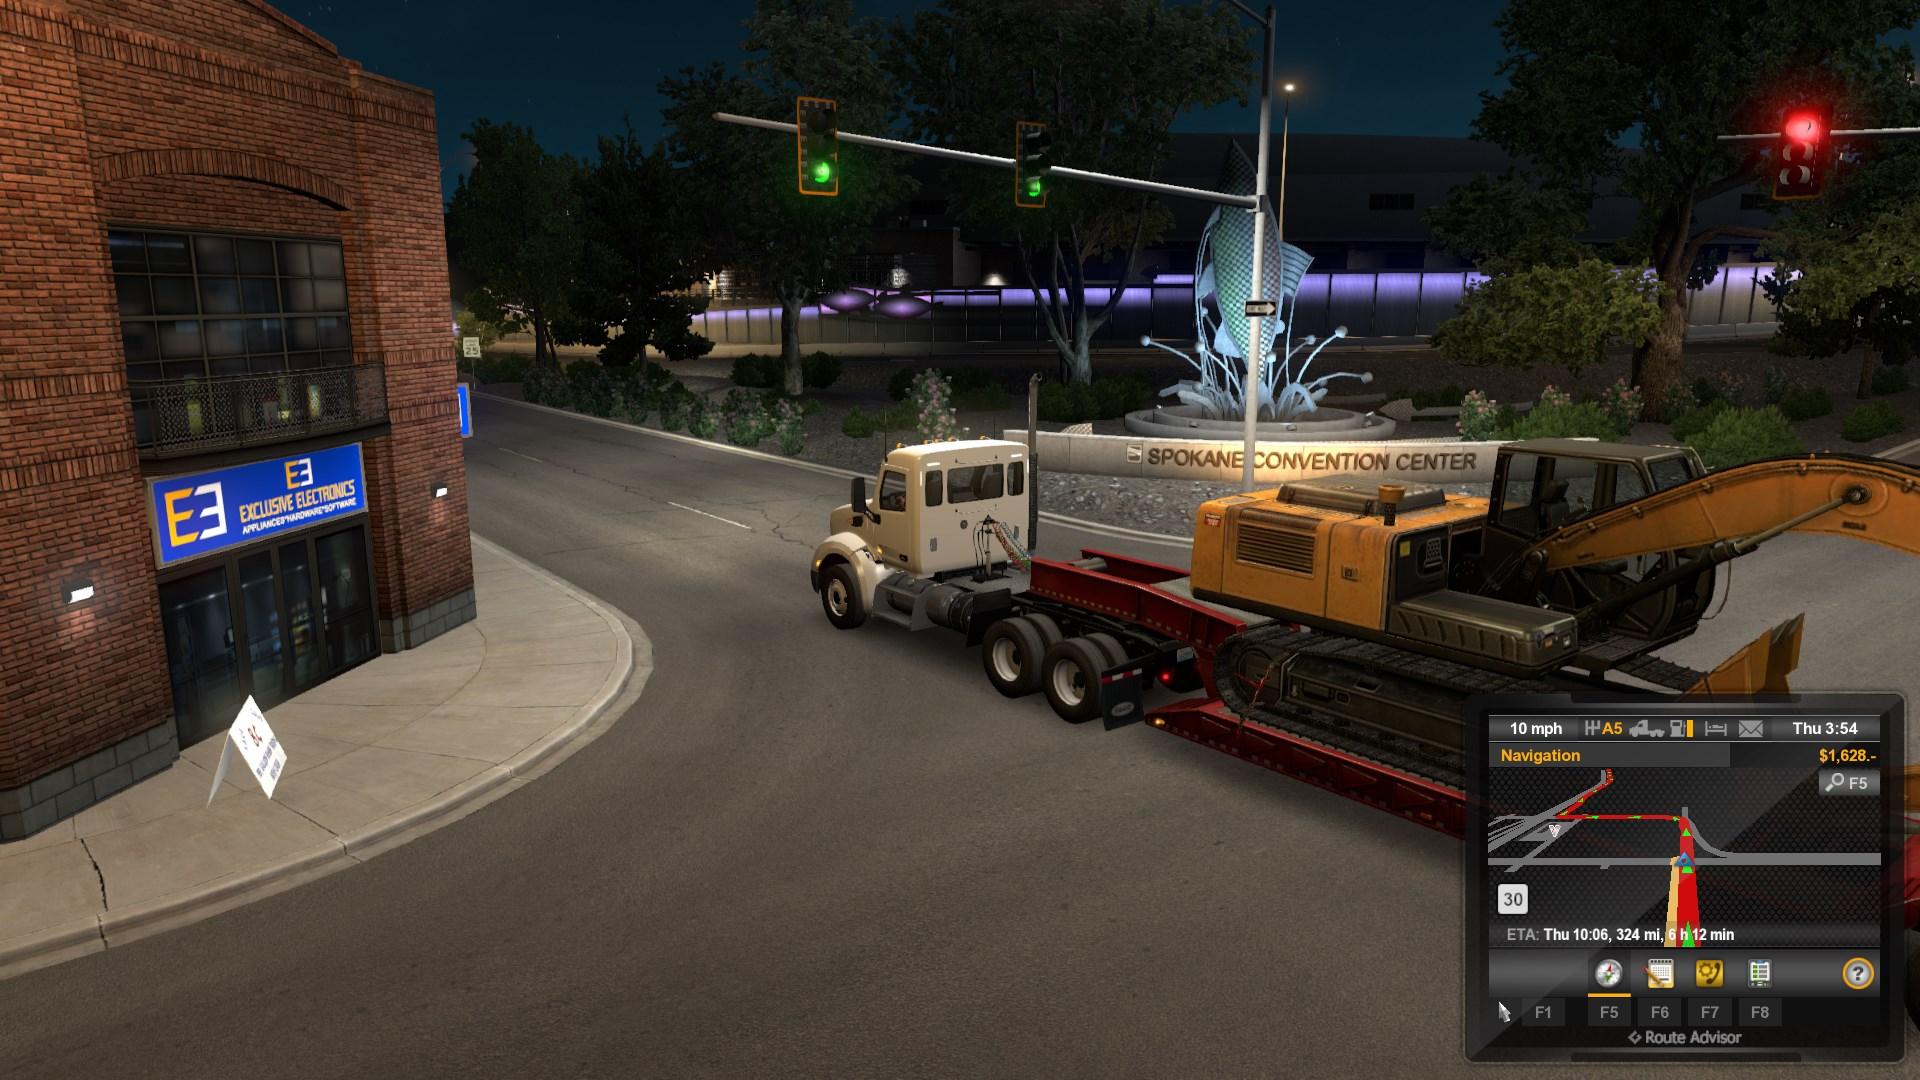 American Trucking Simulator - Page 4 - Tedeschi Trucks Band